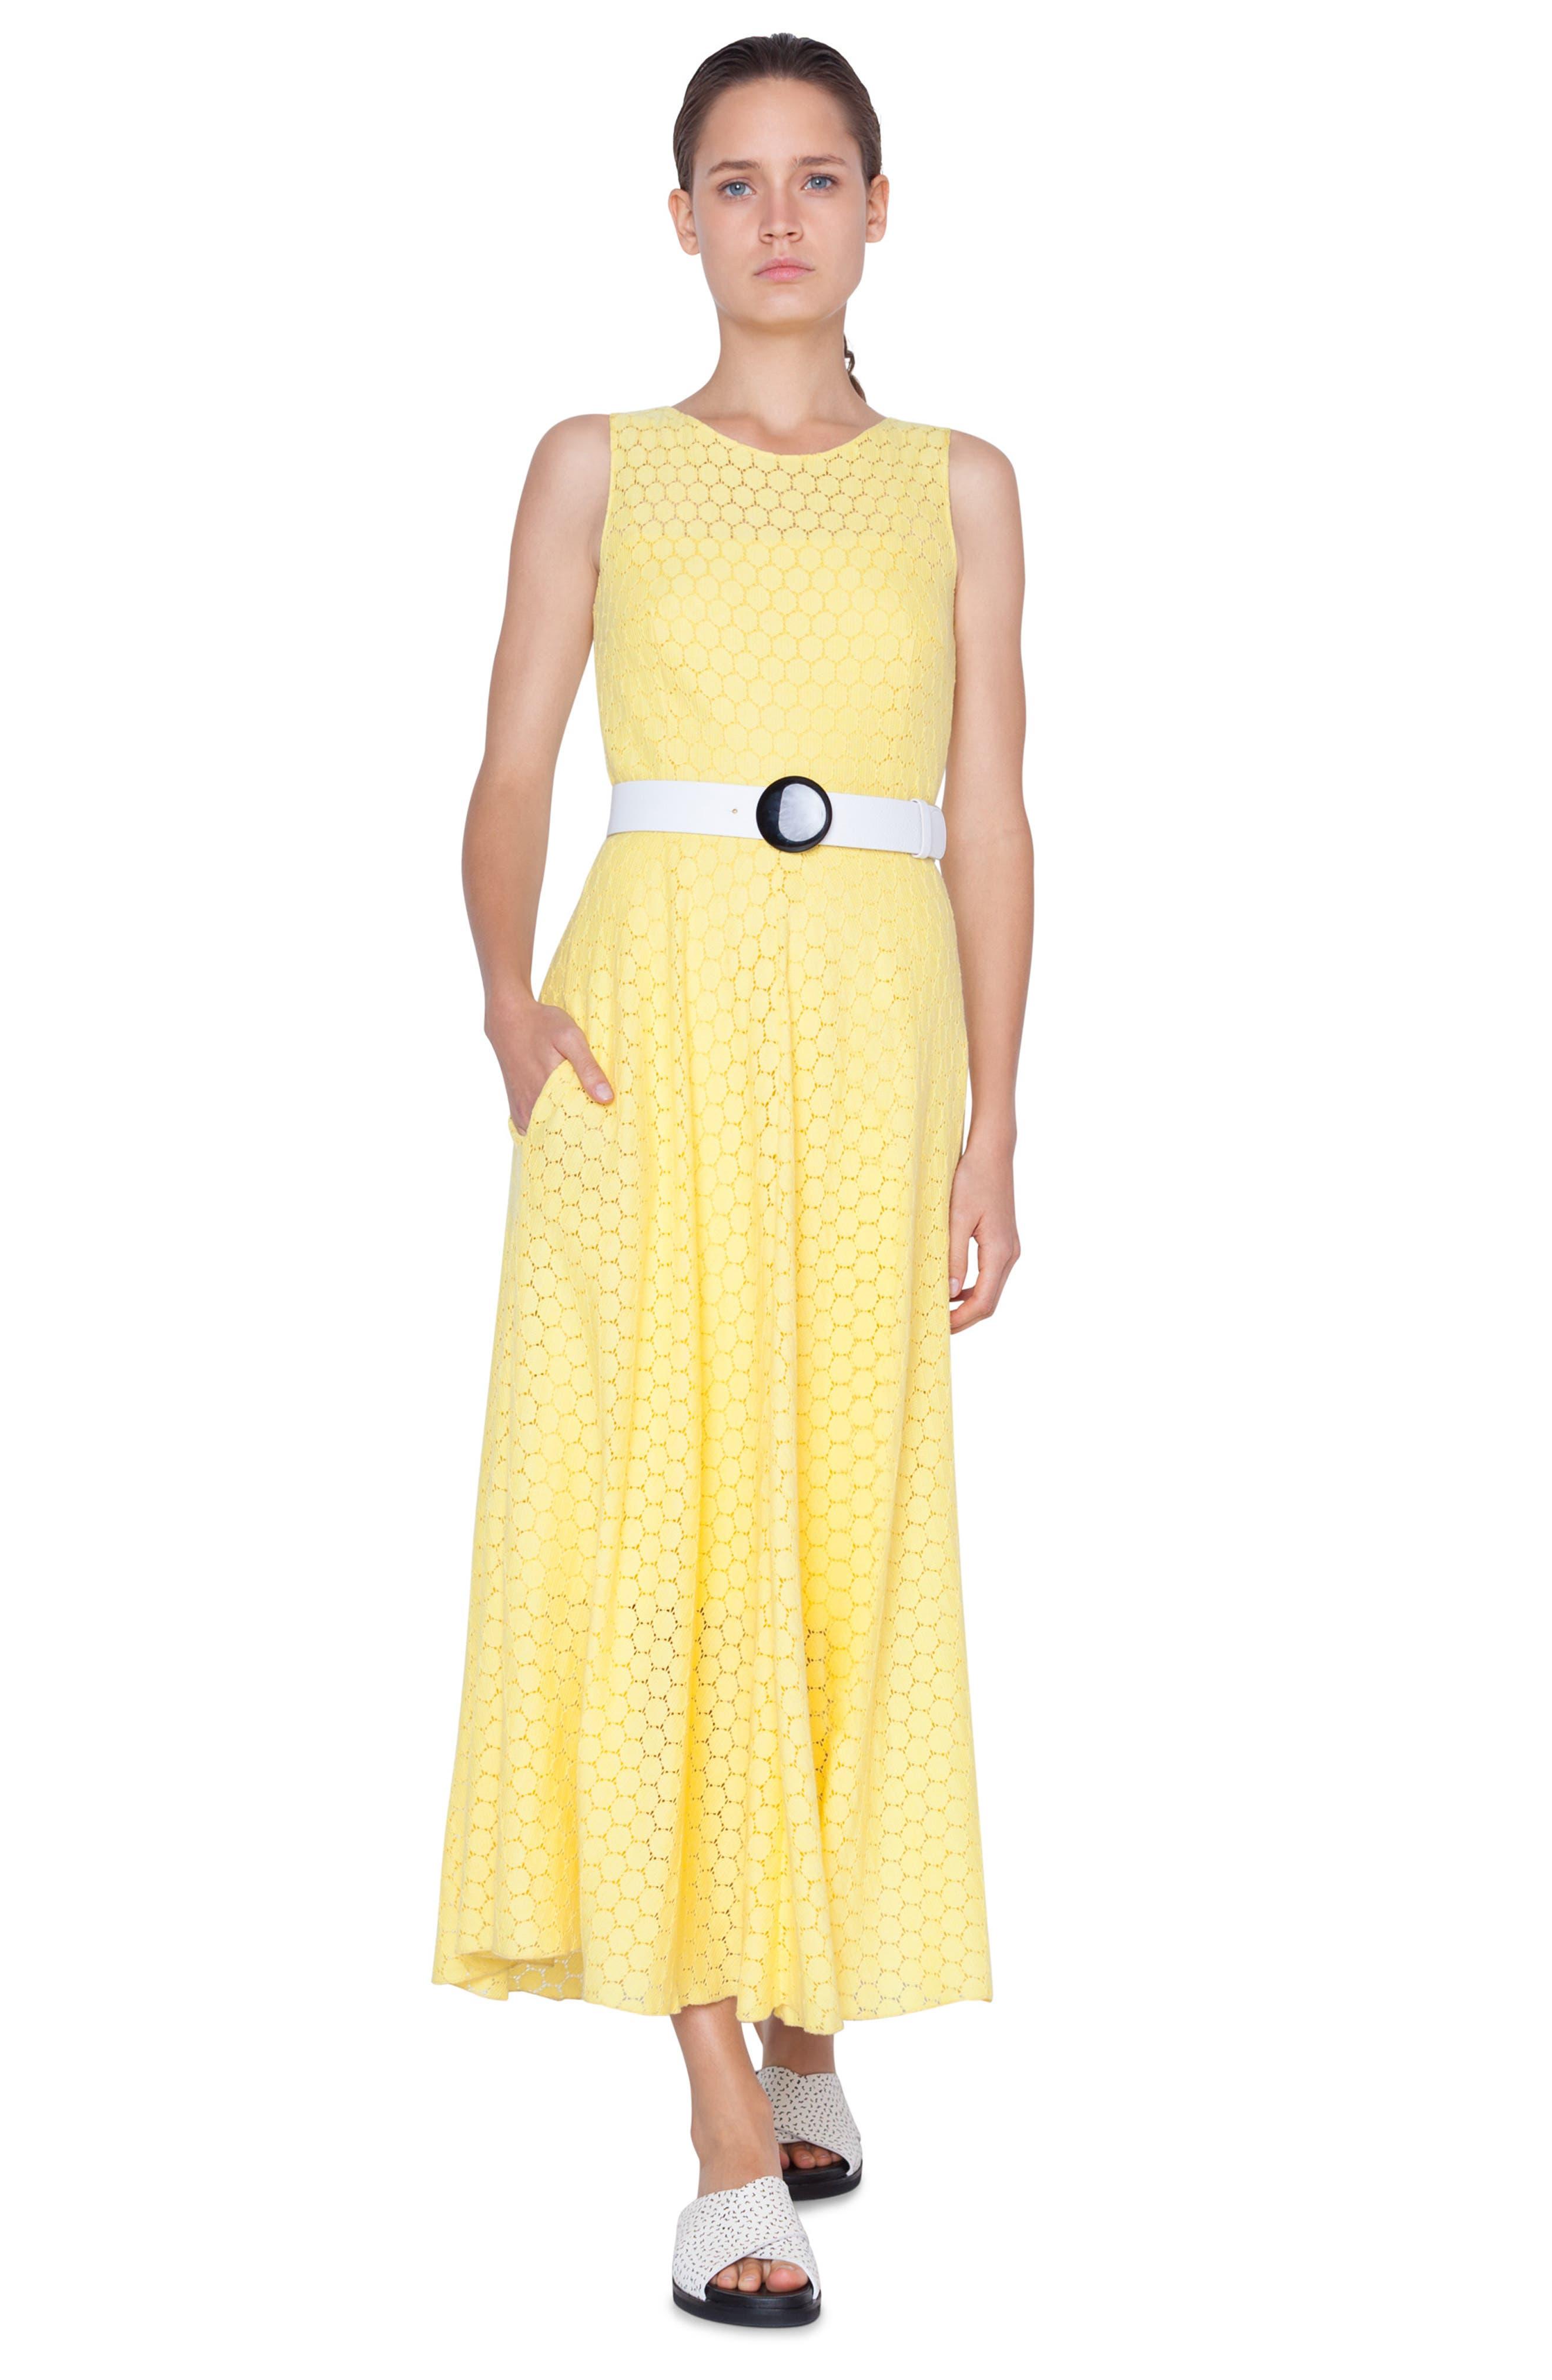 AKRIS PUNTO,                             Belted Lace Dress,                             Alternate thumbnail 3, color,                             LIMONE